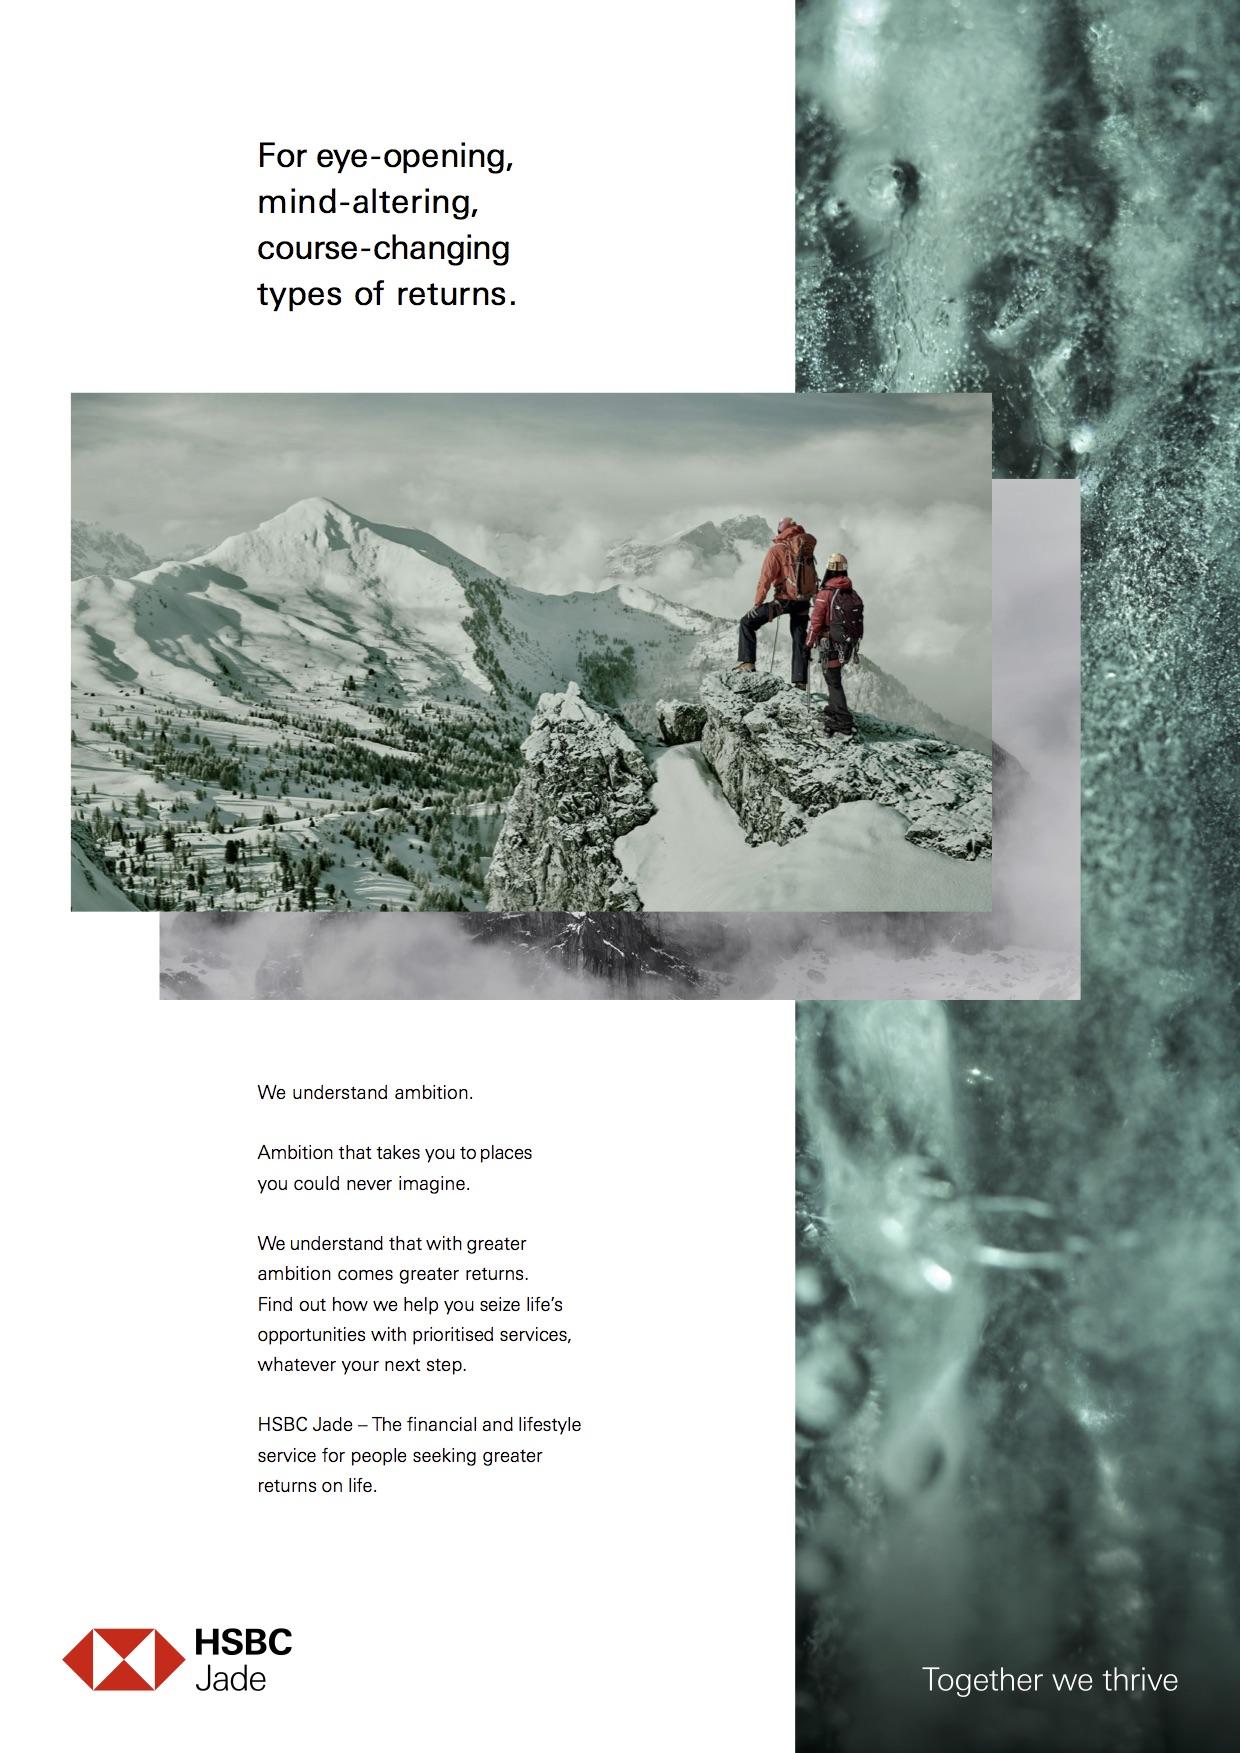 Jade_HSBC_Key MASTER Visual SP_Portrait_Mountain.jpg